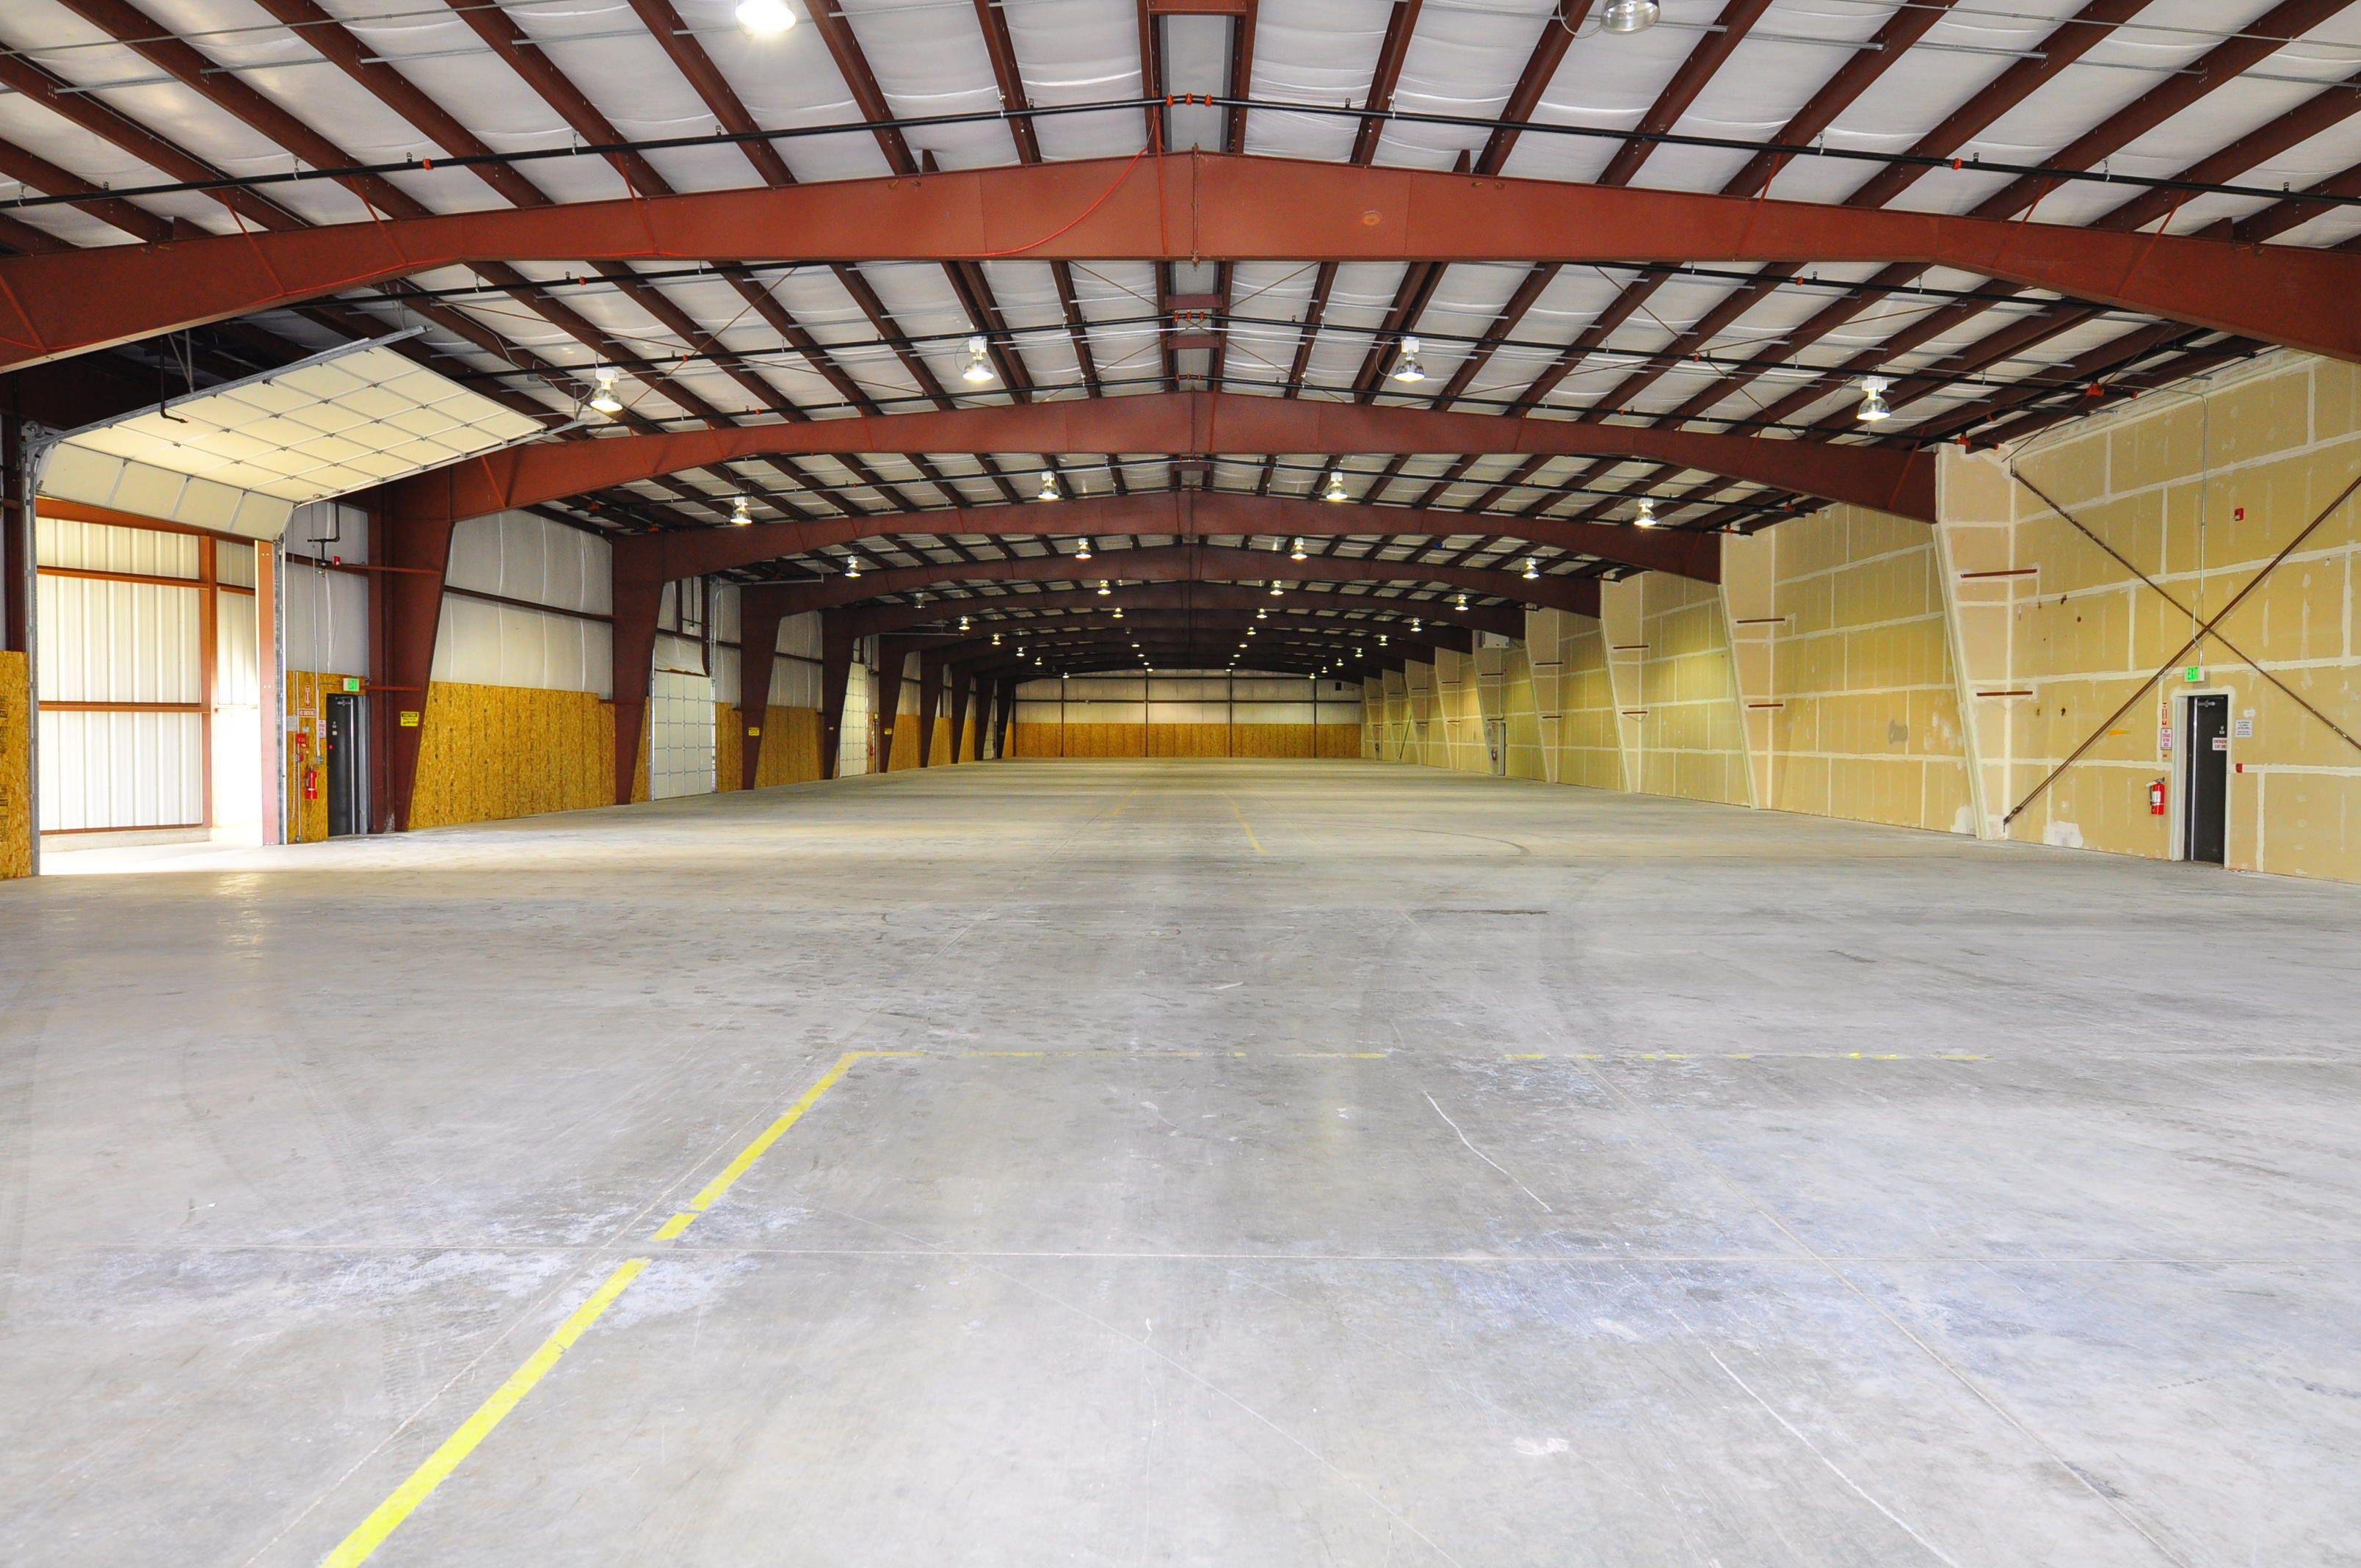 Commercial Hanger Space Open Industrial Warehouse Concrete Floors Block Walls Garage Entry Doors Ste Commercial Property Design Property For Rent Ajman